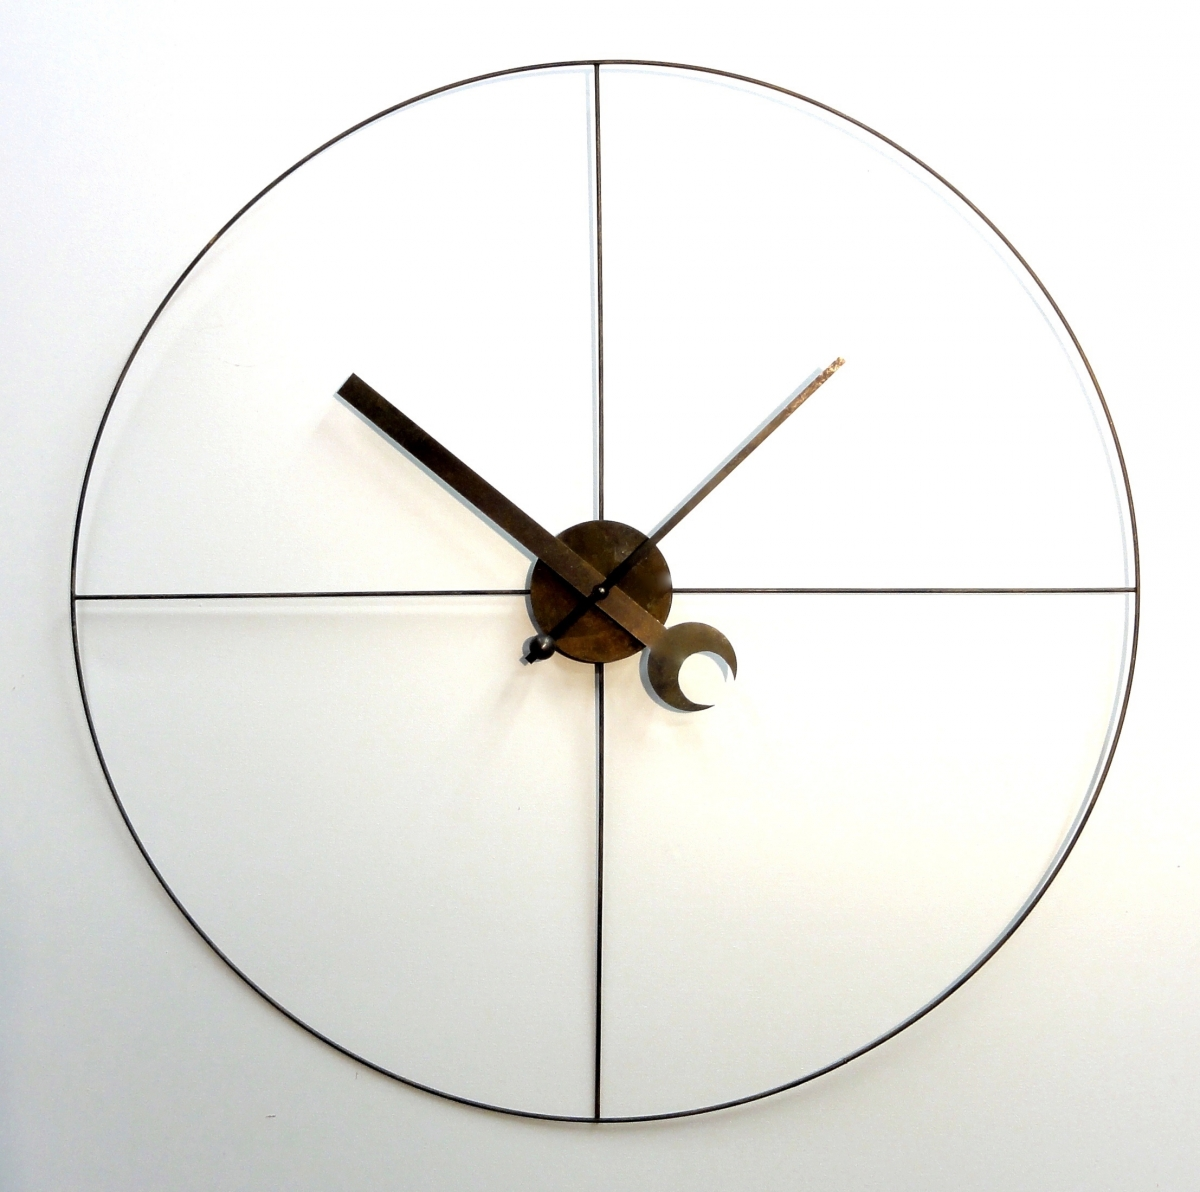 Steampunk Industrial Clock (minimalist) by Art Donovan (large view)